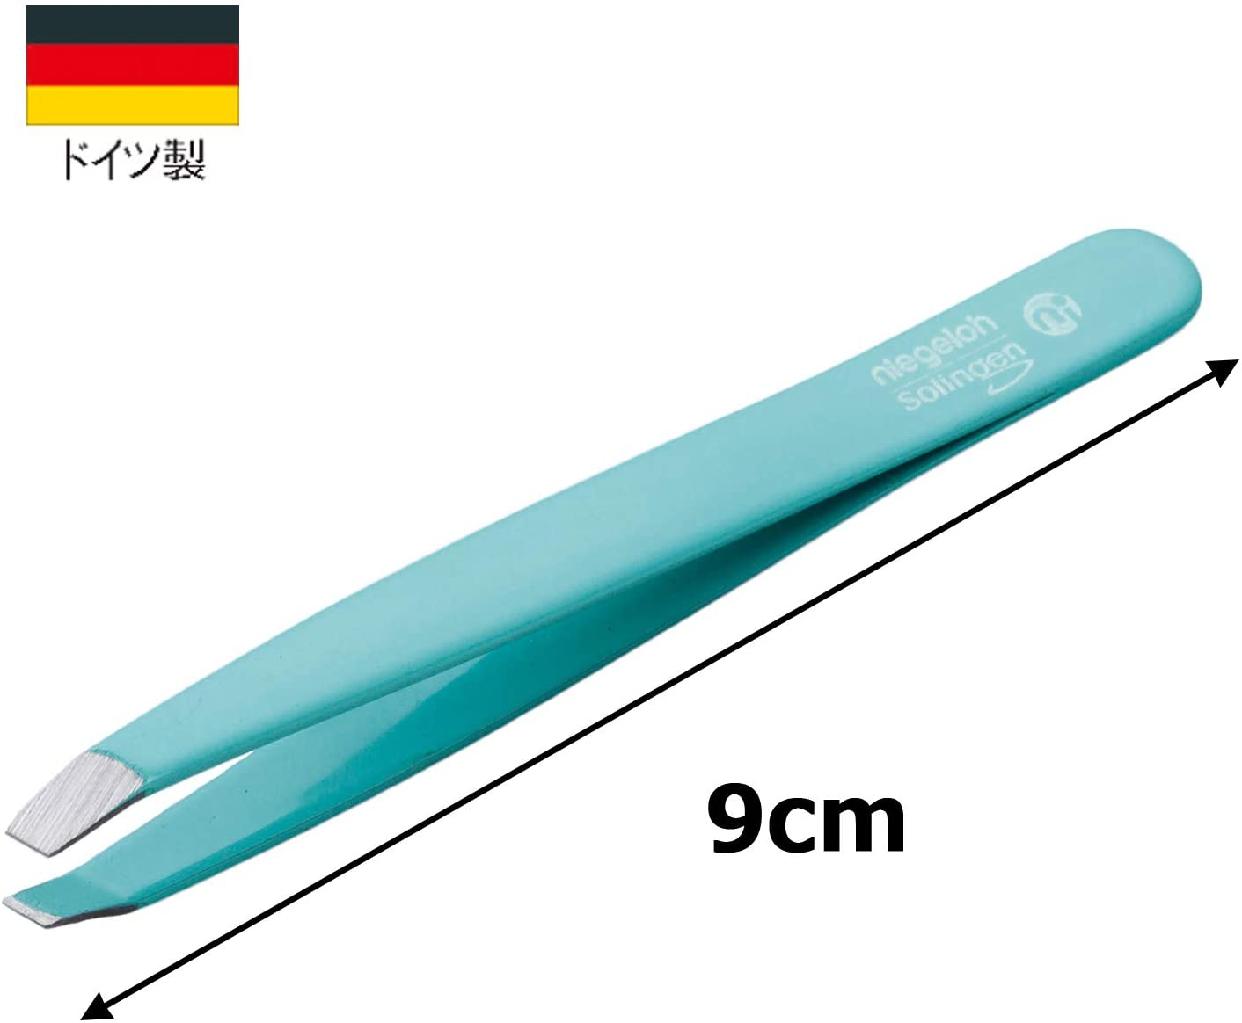 Niegeloh(ドイツ ゾーリンゲン)ツイザーの商品画像7